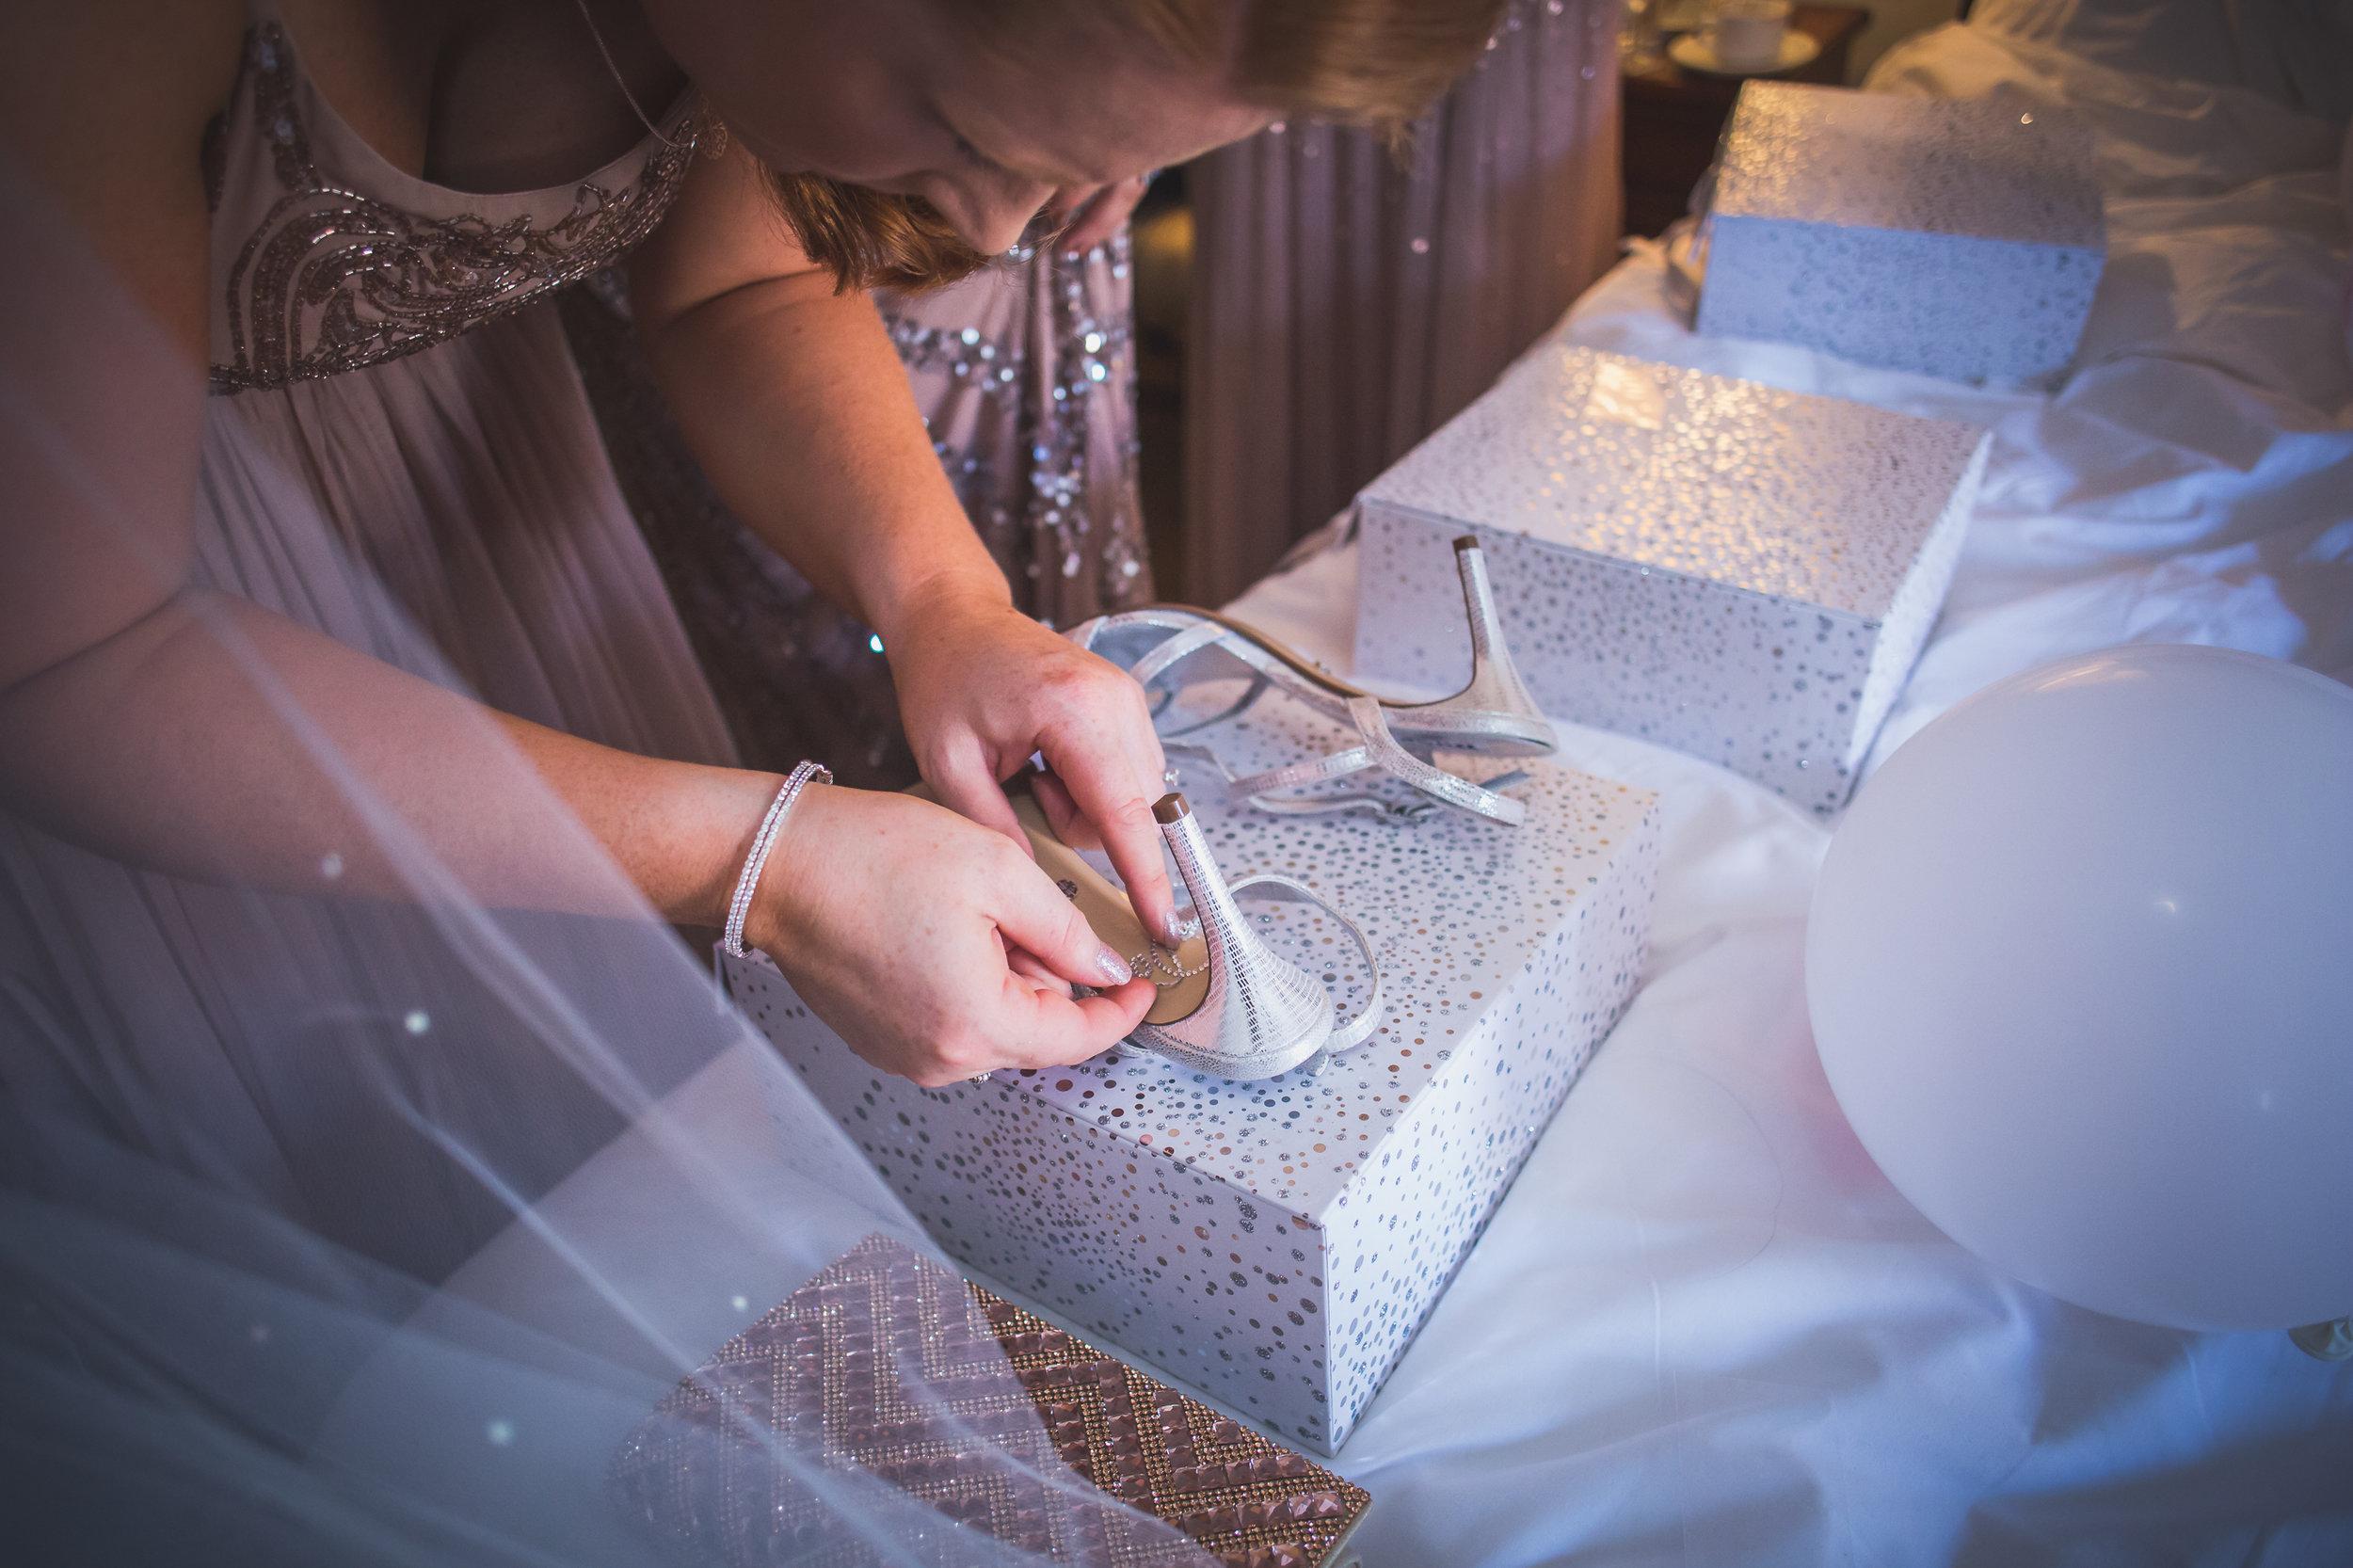 Grittenham Barn female wedding photographers west sussex petworth social-20.jpg